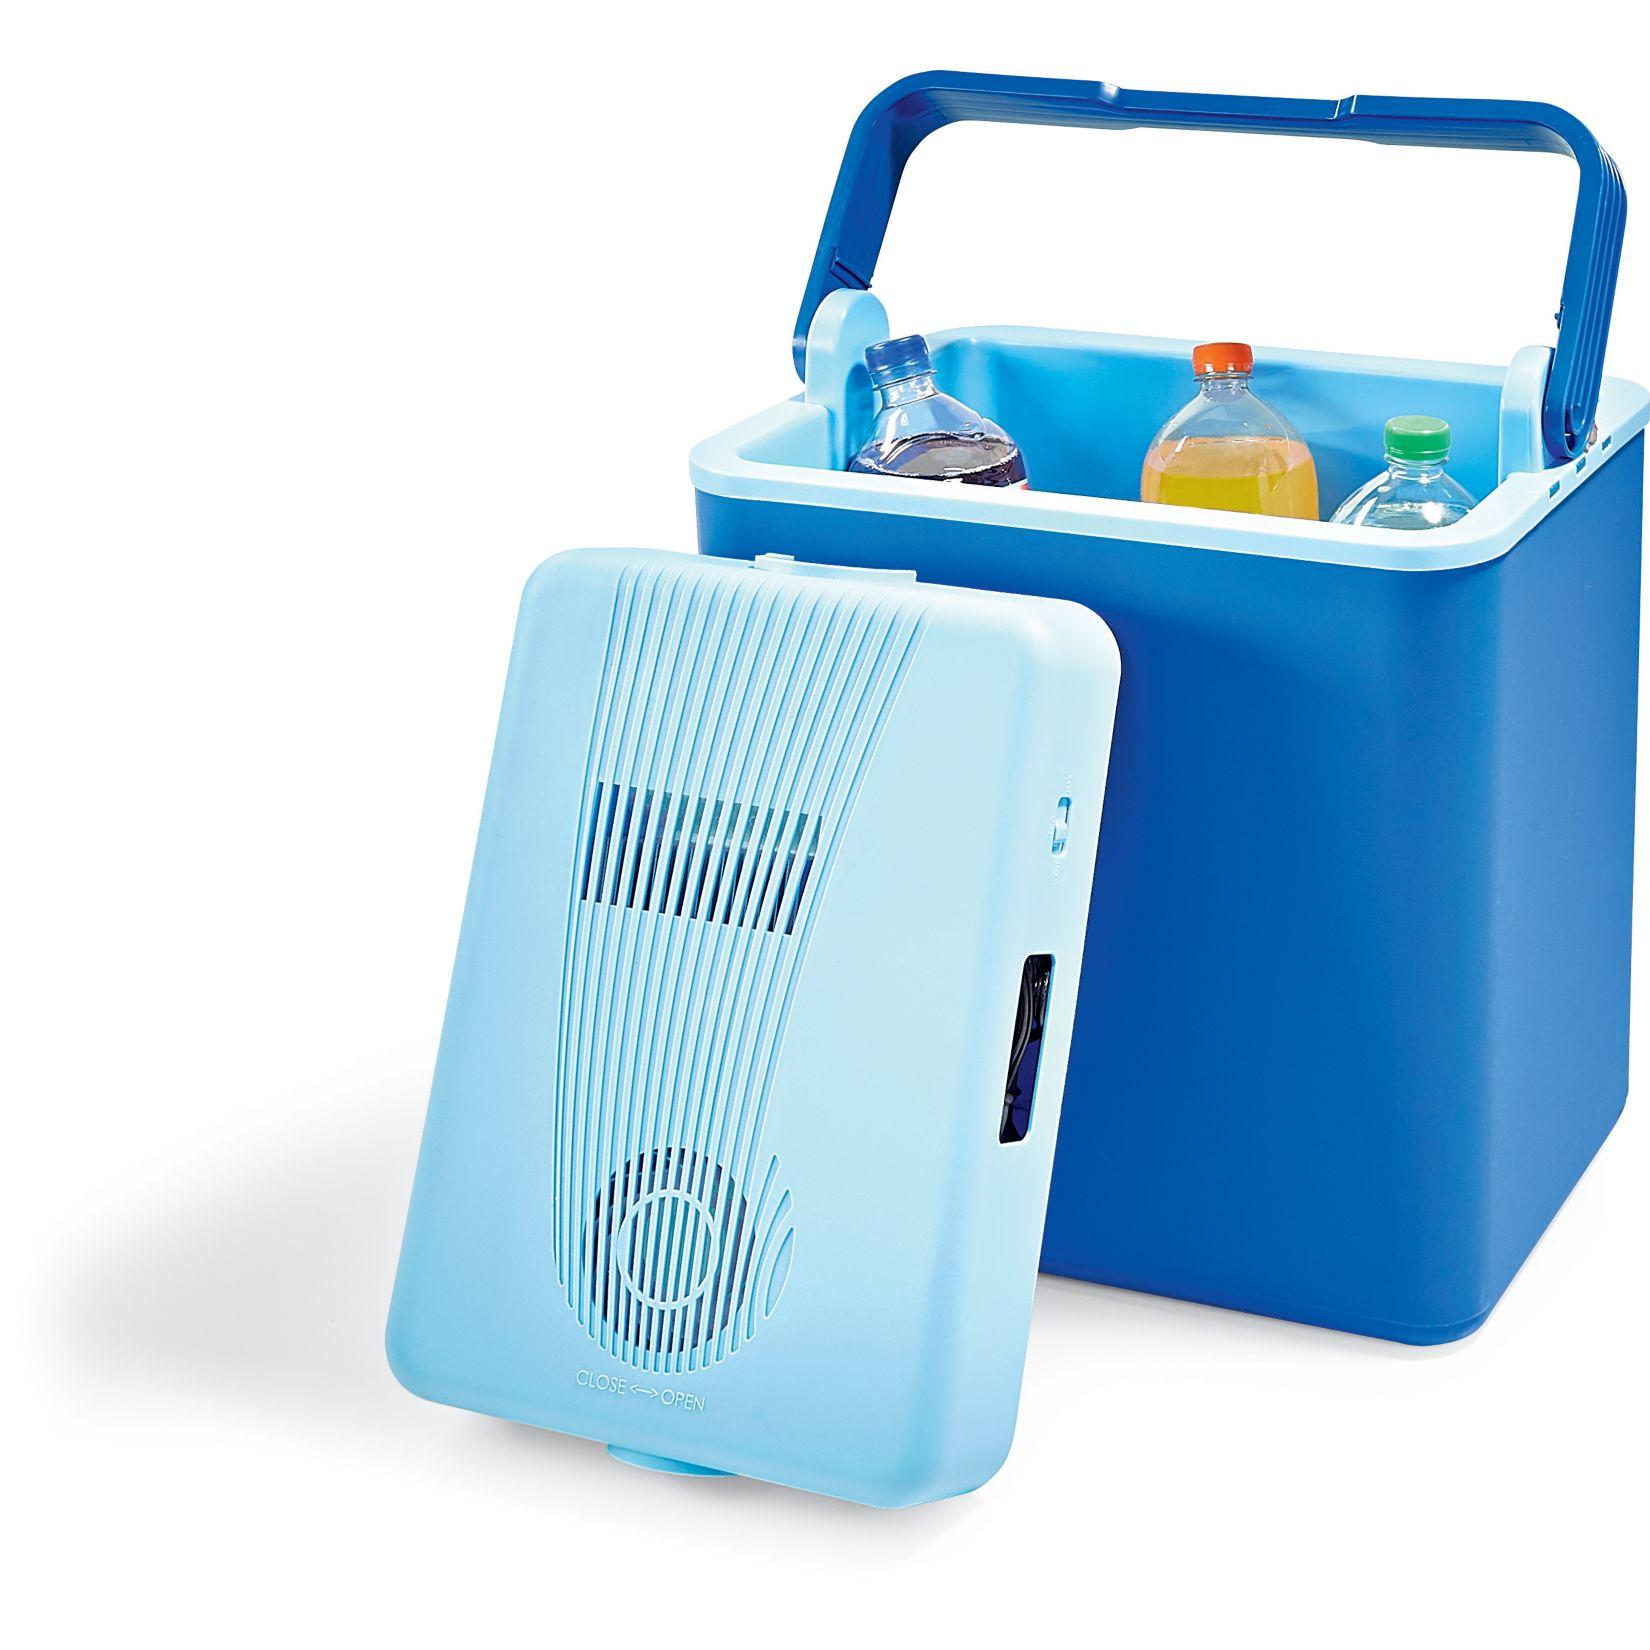 Kühlbox Mini Kühlschrank für PKW / LKW elektro 32L 12 / 230V Bild 2